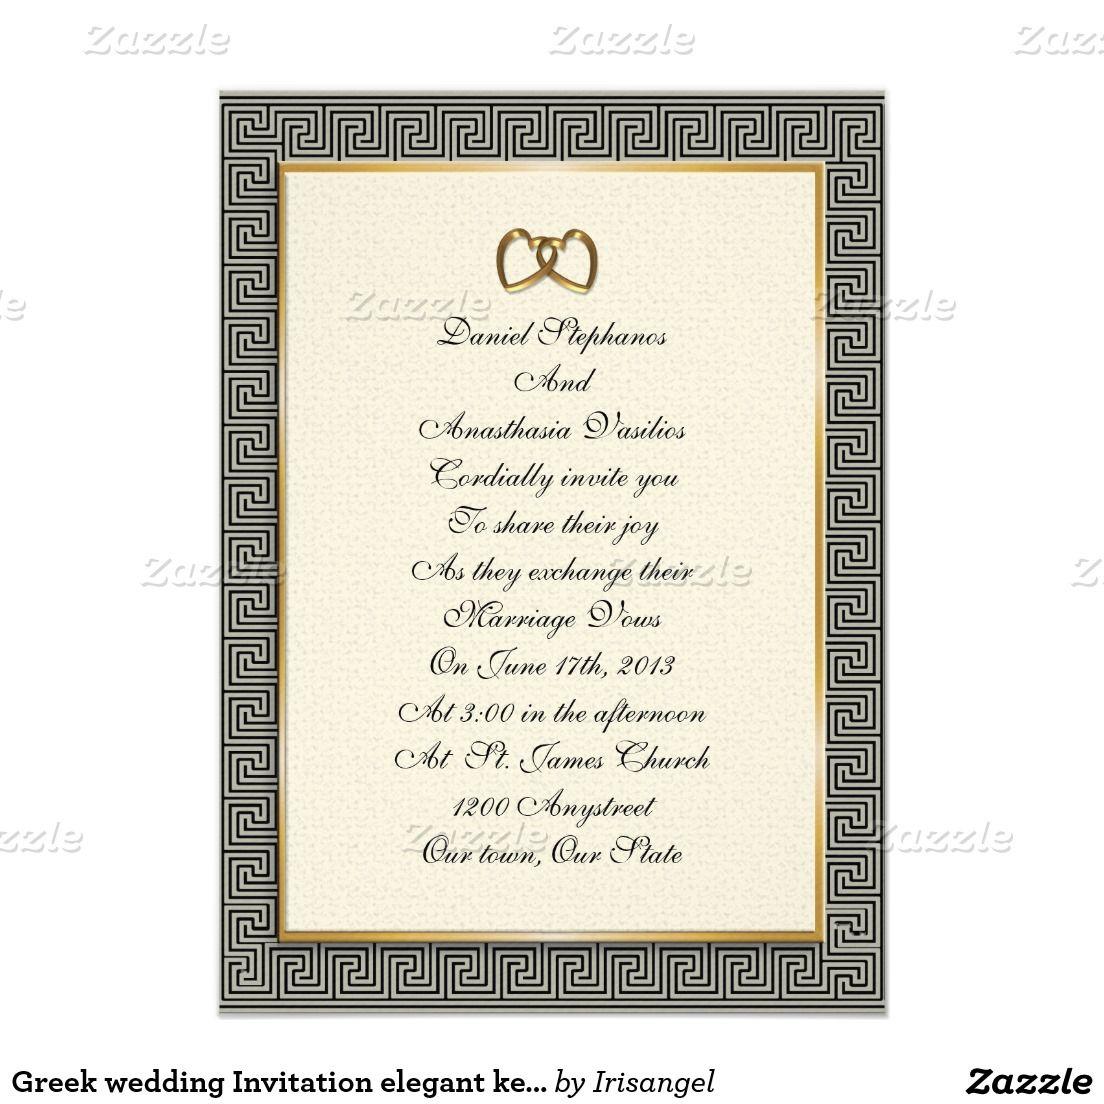 Greek wedding Invitation elegant key design | Wedding invitations ...